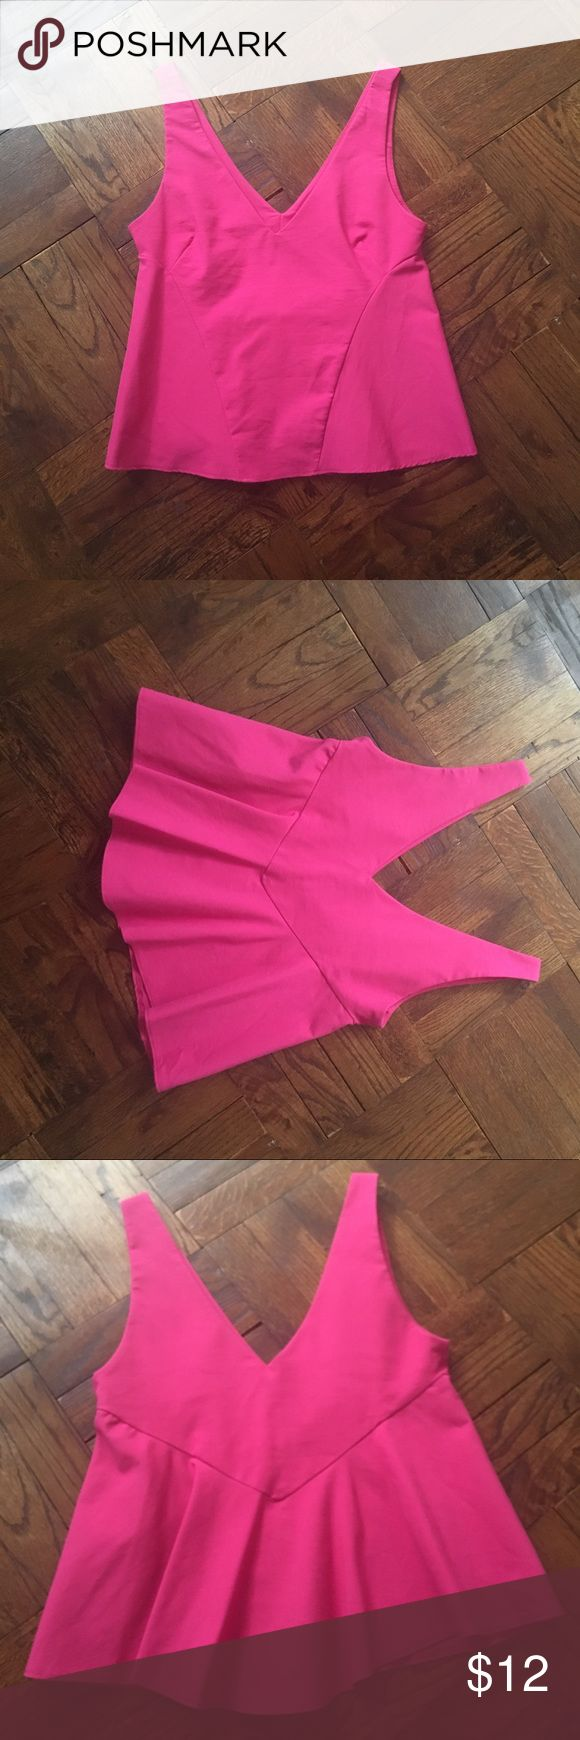 Zara pink peplum top Adorable Zara pink vneck peplum top Zara Tops Tank Tops